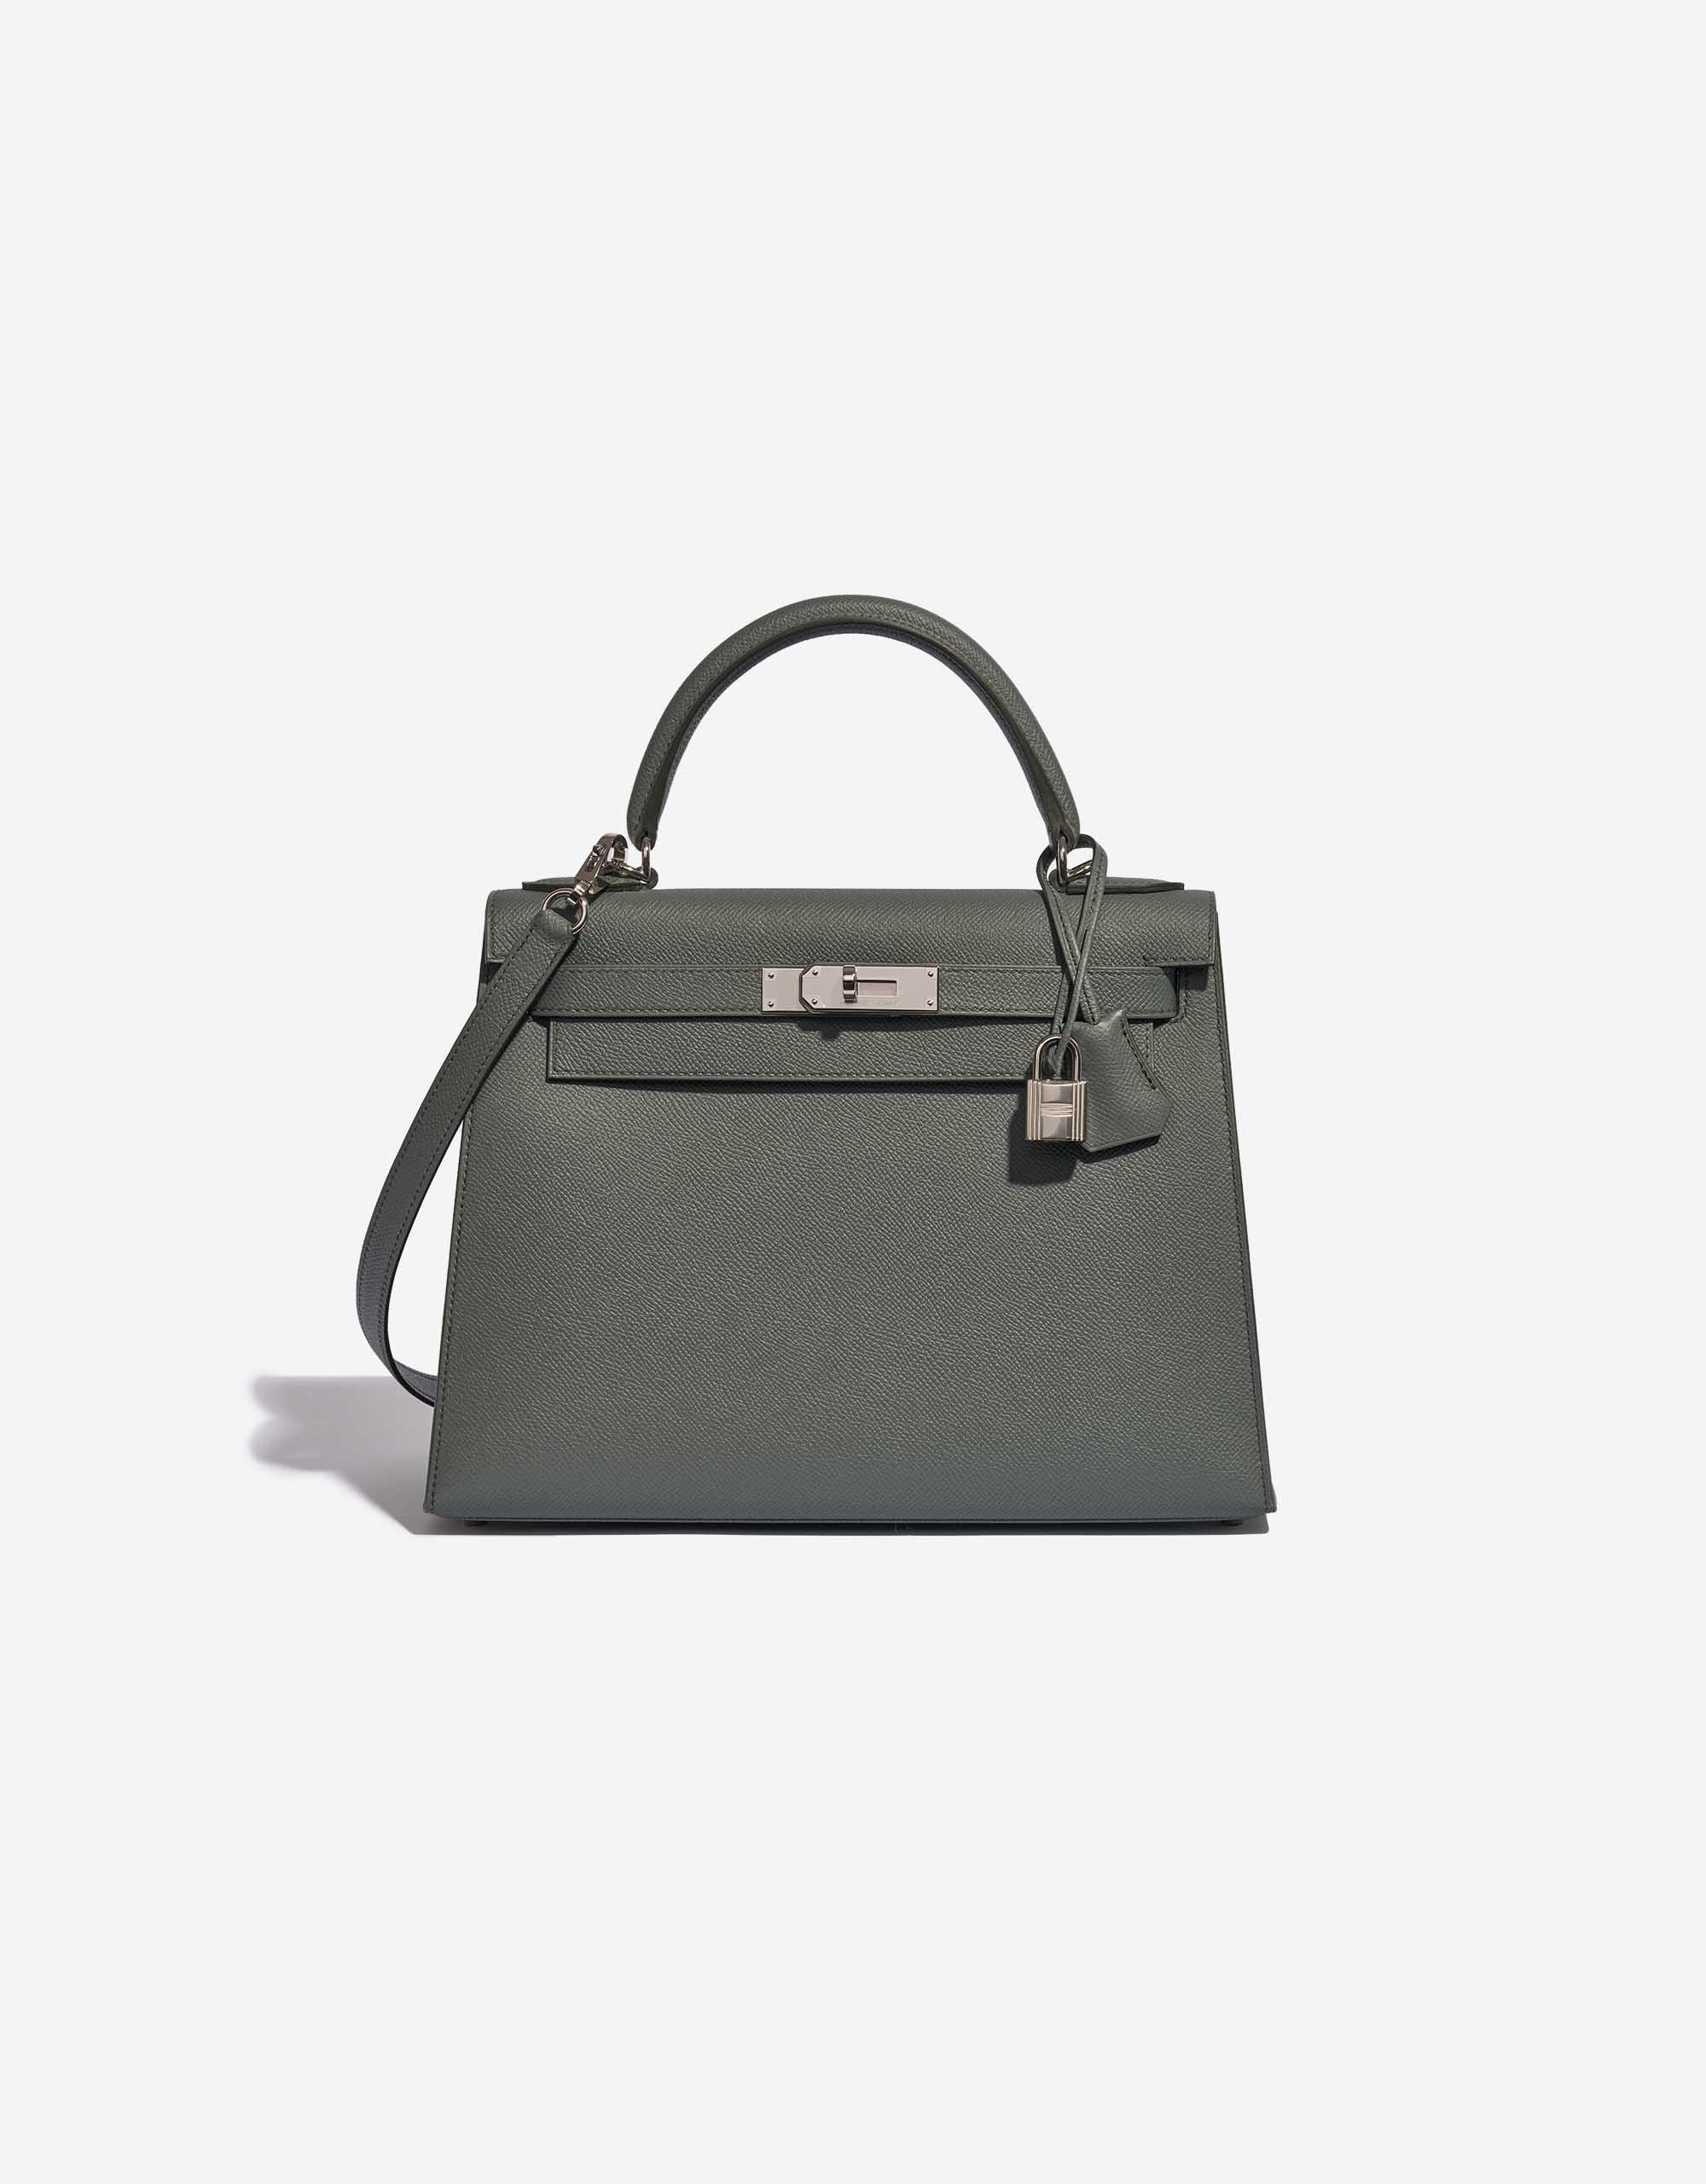 Hermès Kelly 28 Epsom Vert Amande | SACLÀB